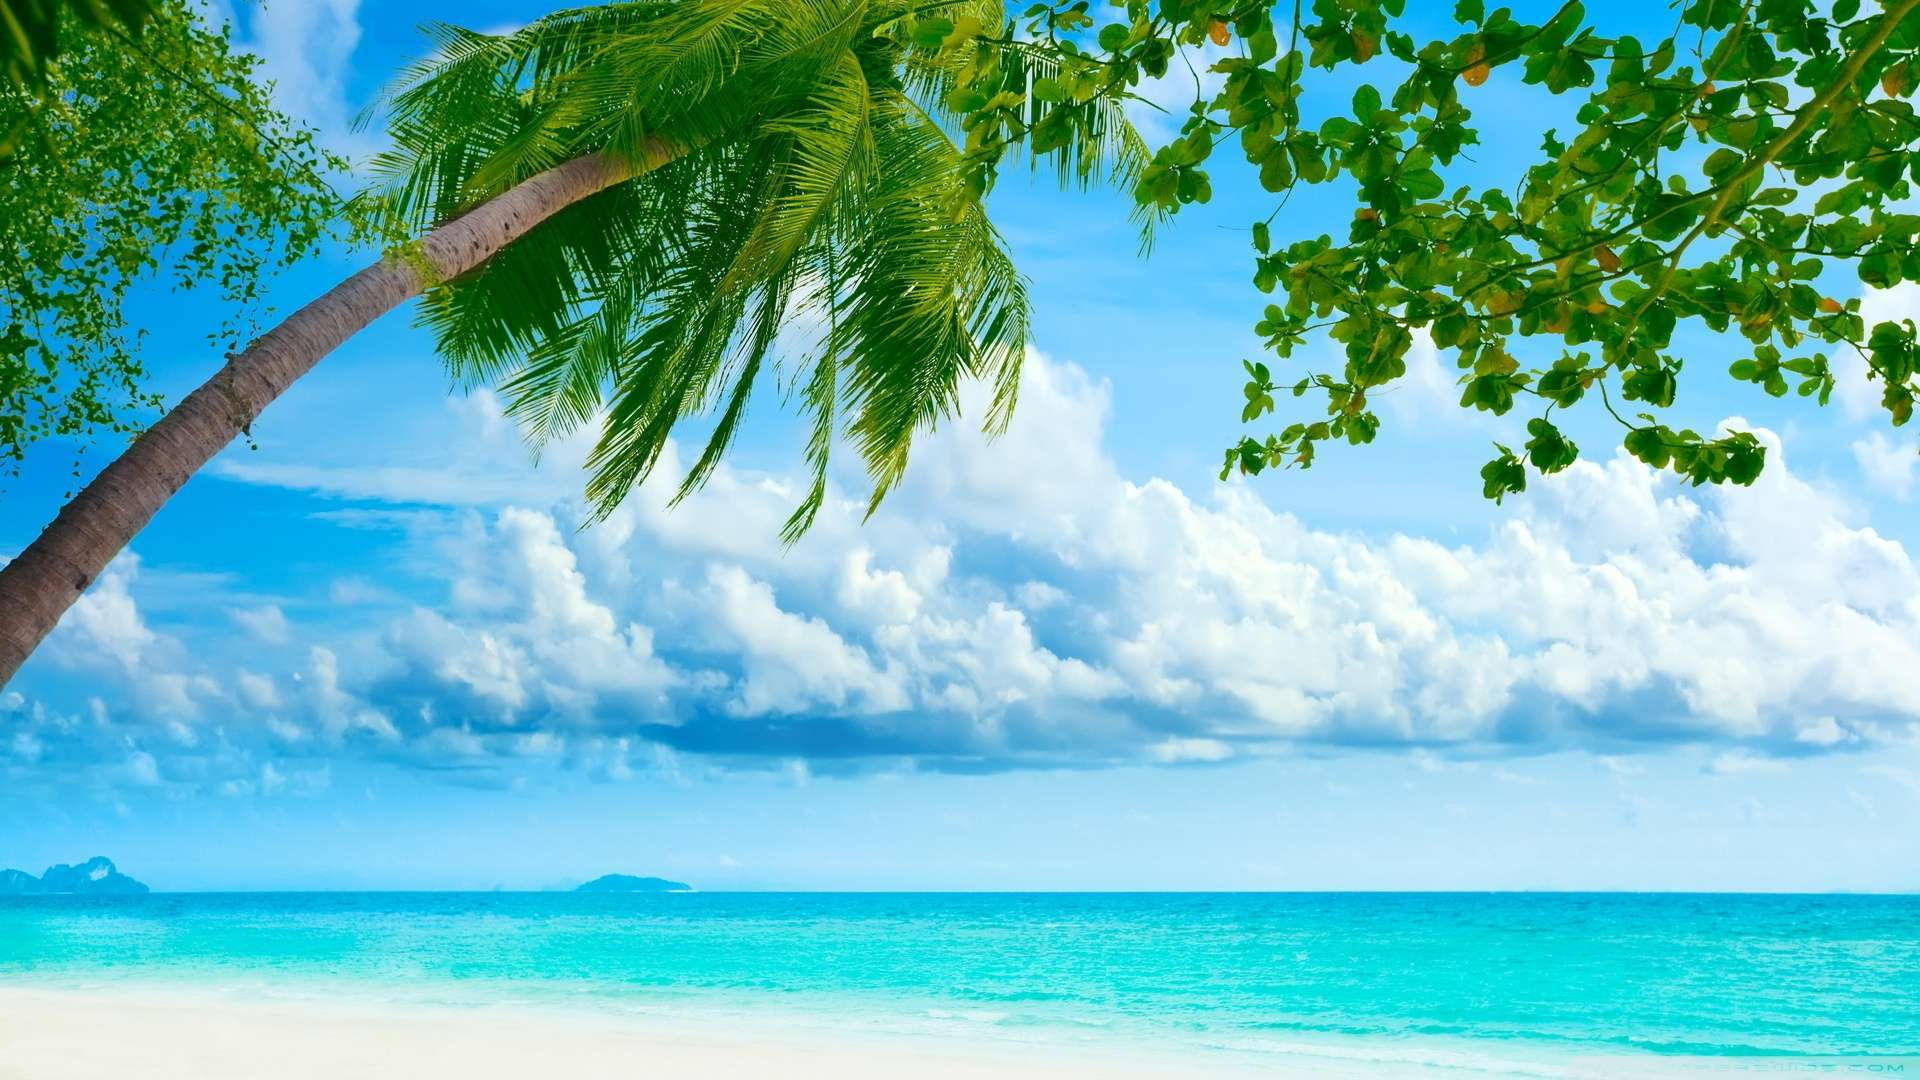 Wallpaper Tropical Beach Resorts Wallpaper 1080p HD Upload at 1920x1080